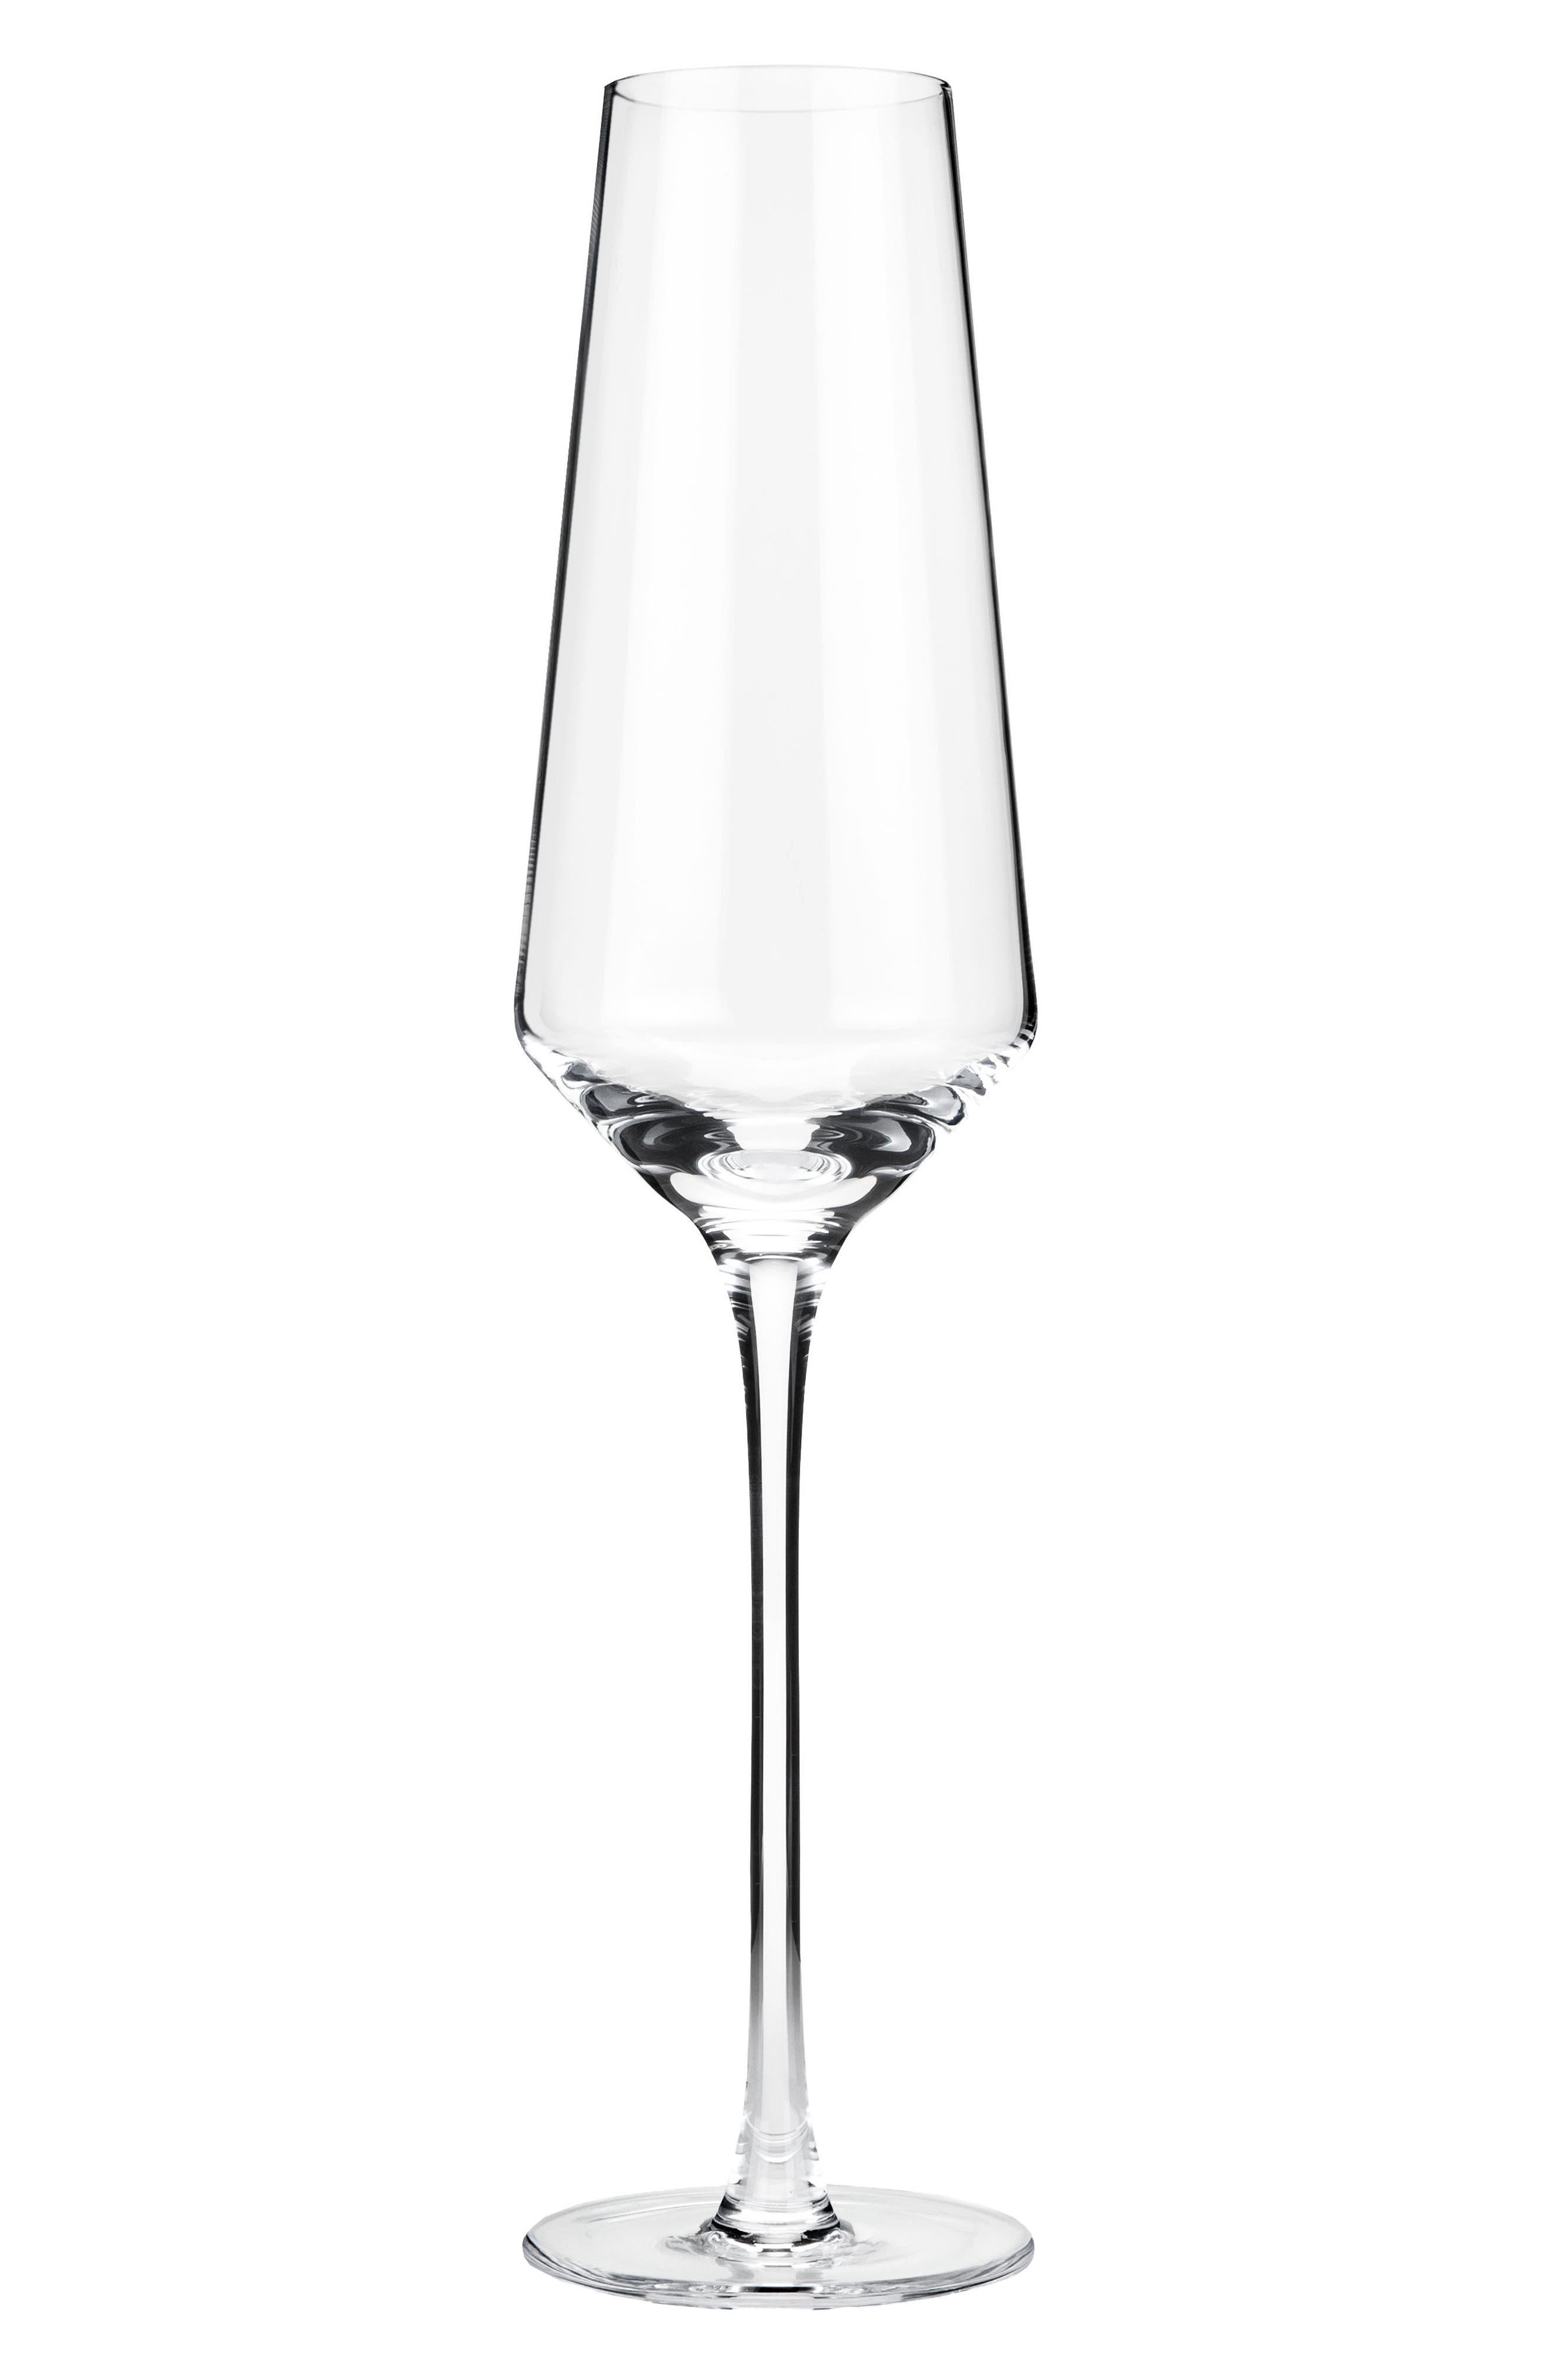 Raye Set of 2 Crystal Champagne Flutes,                             Main thumbnail 1, color,                             Clear